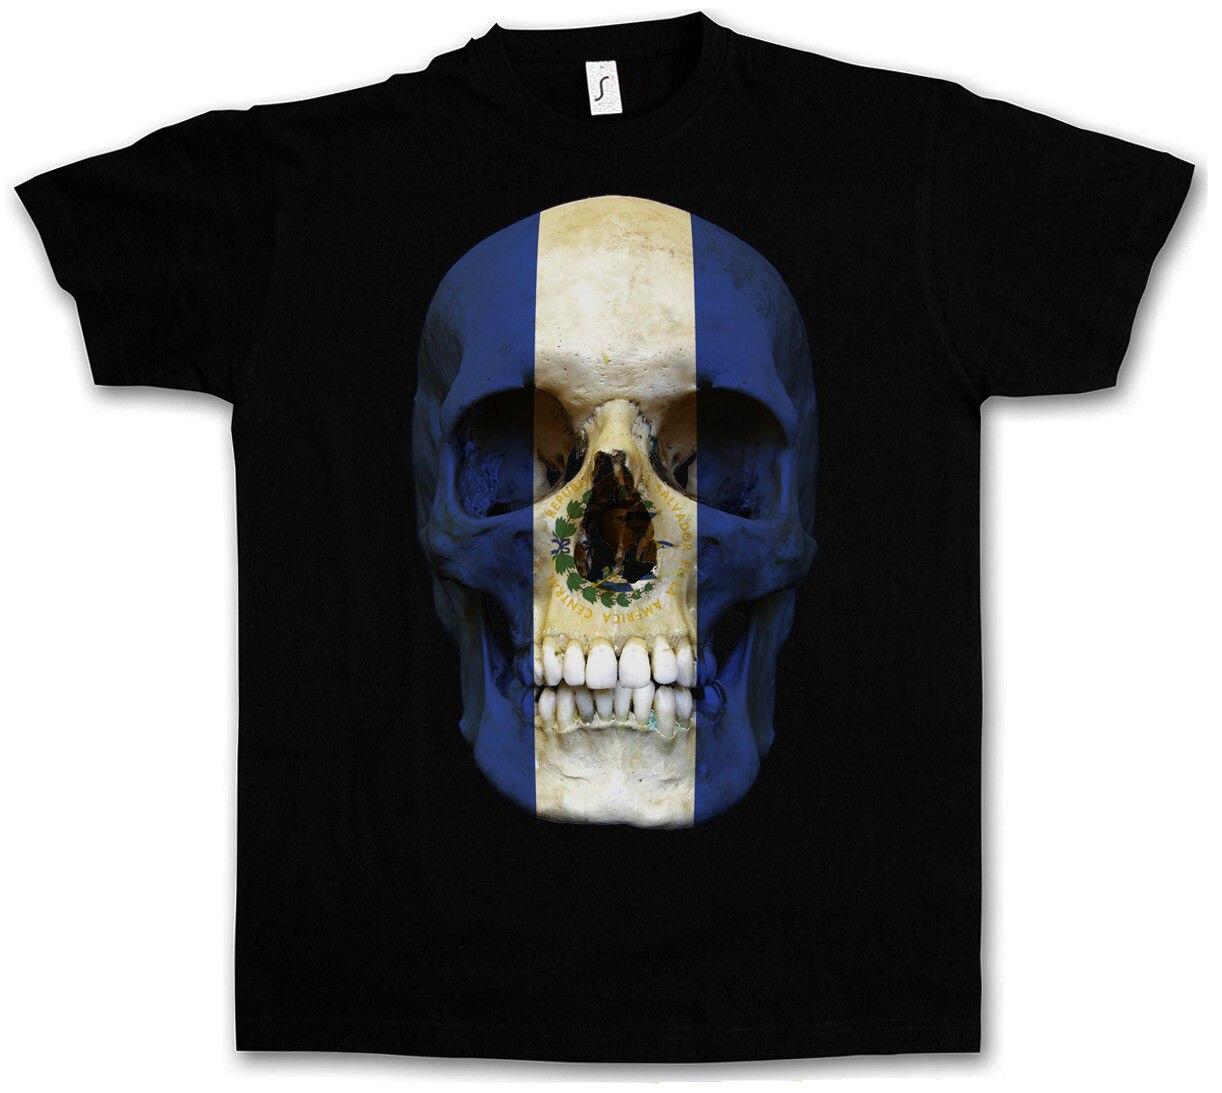 Классический Сальвадор череп флаг футболка Байкер MC баннер рубашка Размеры S 5Xl